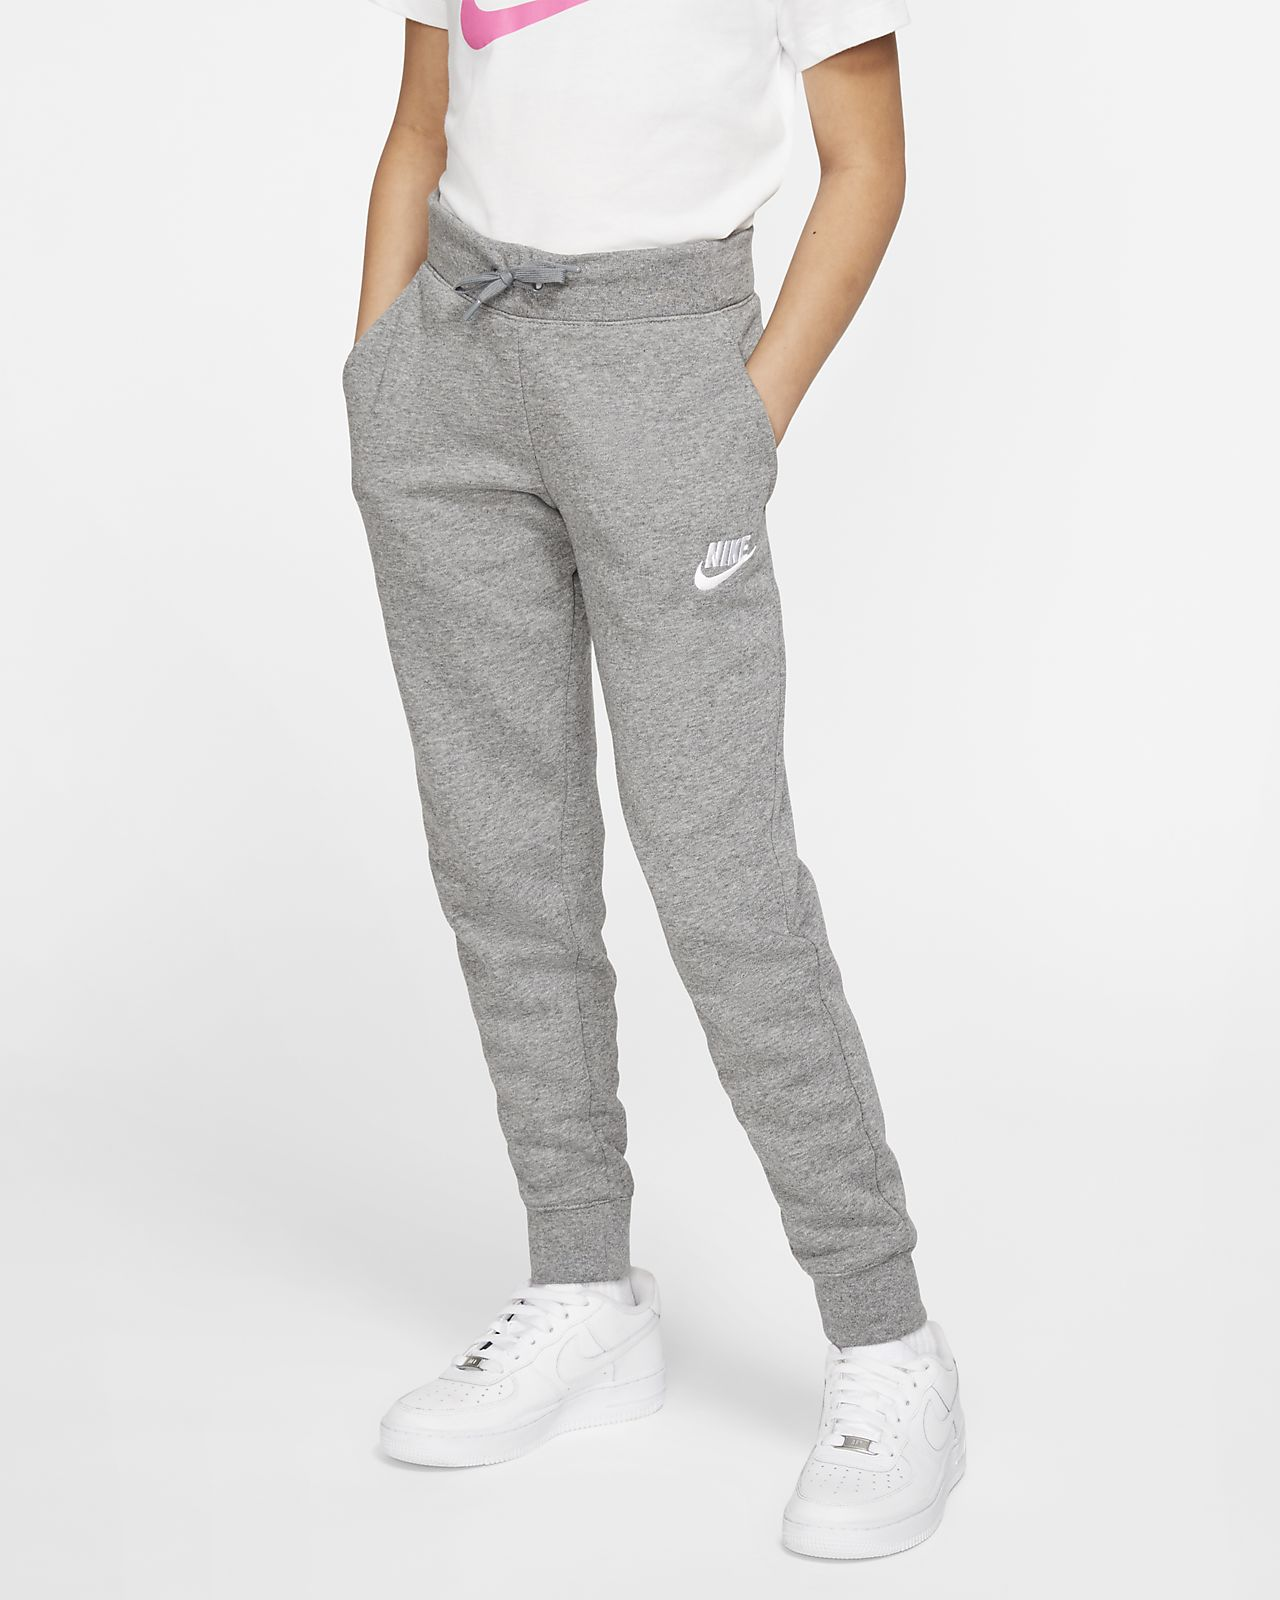 Pantaloni Nike Sportswear - Ragazza